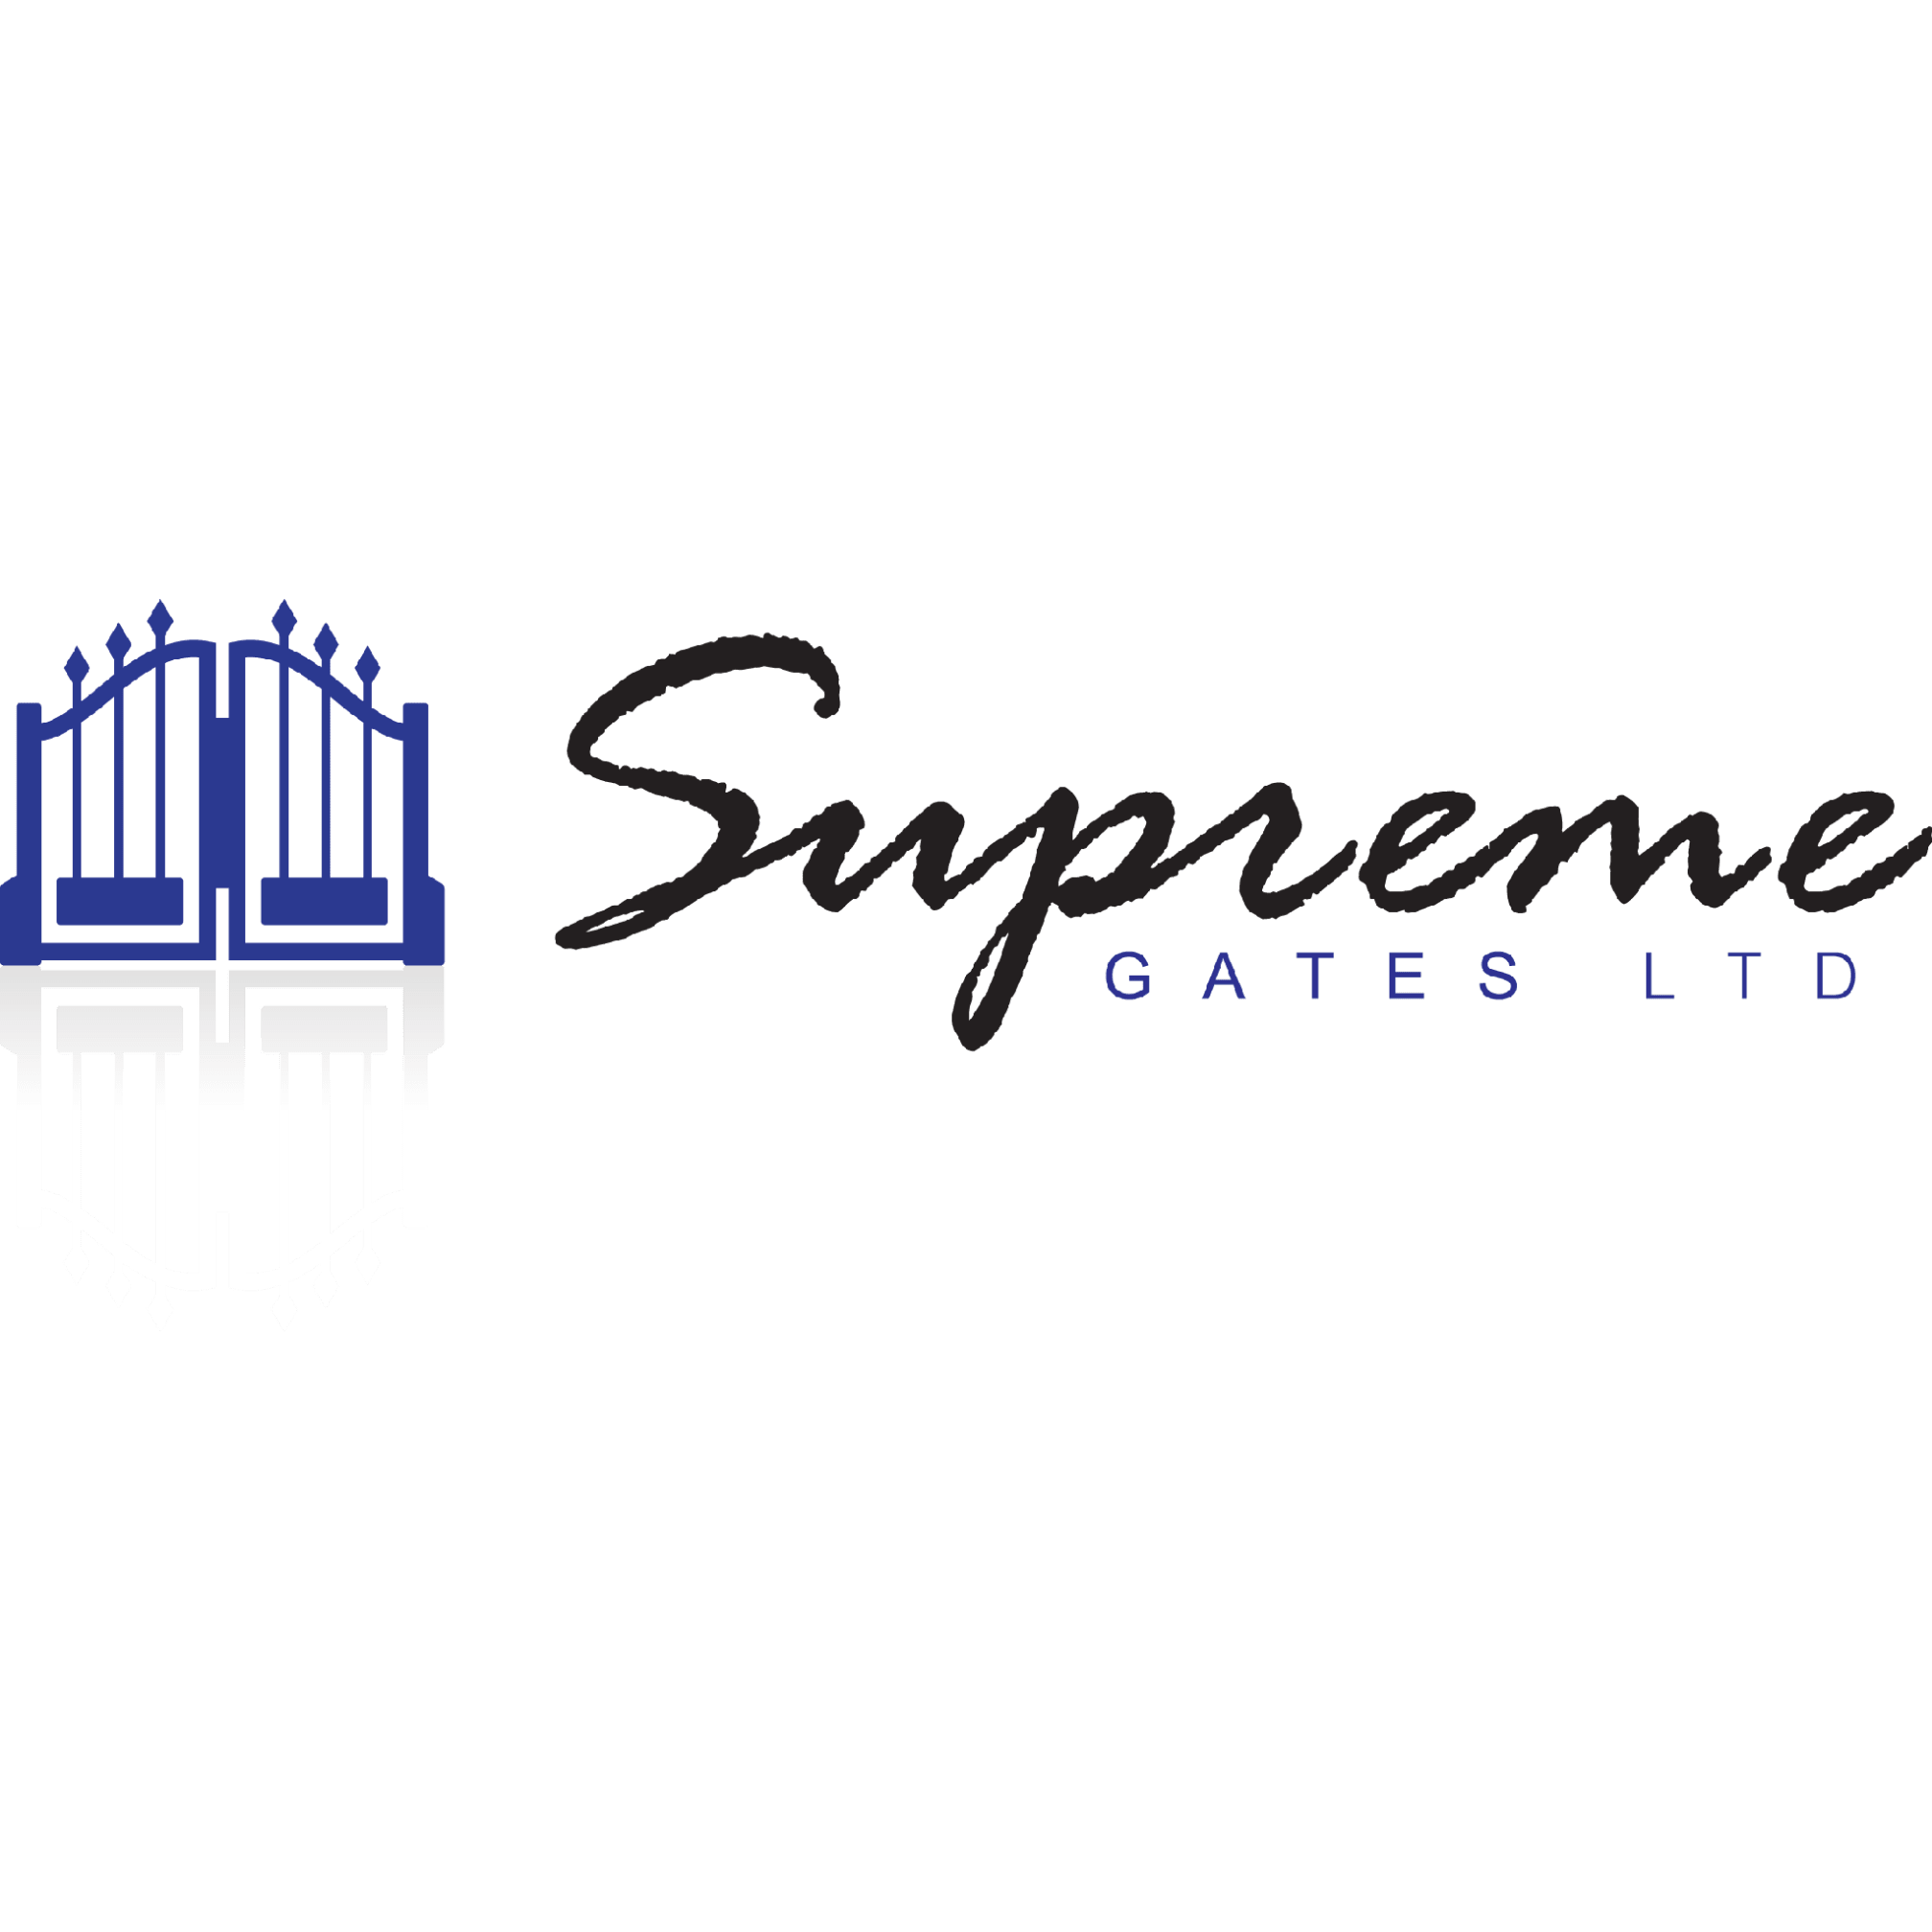 Supreme Gates Ltd - Henley-On-Thames, Oxfordshire RG9 5LA - 07809 421301   ShowMeLocal.com